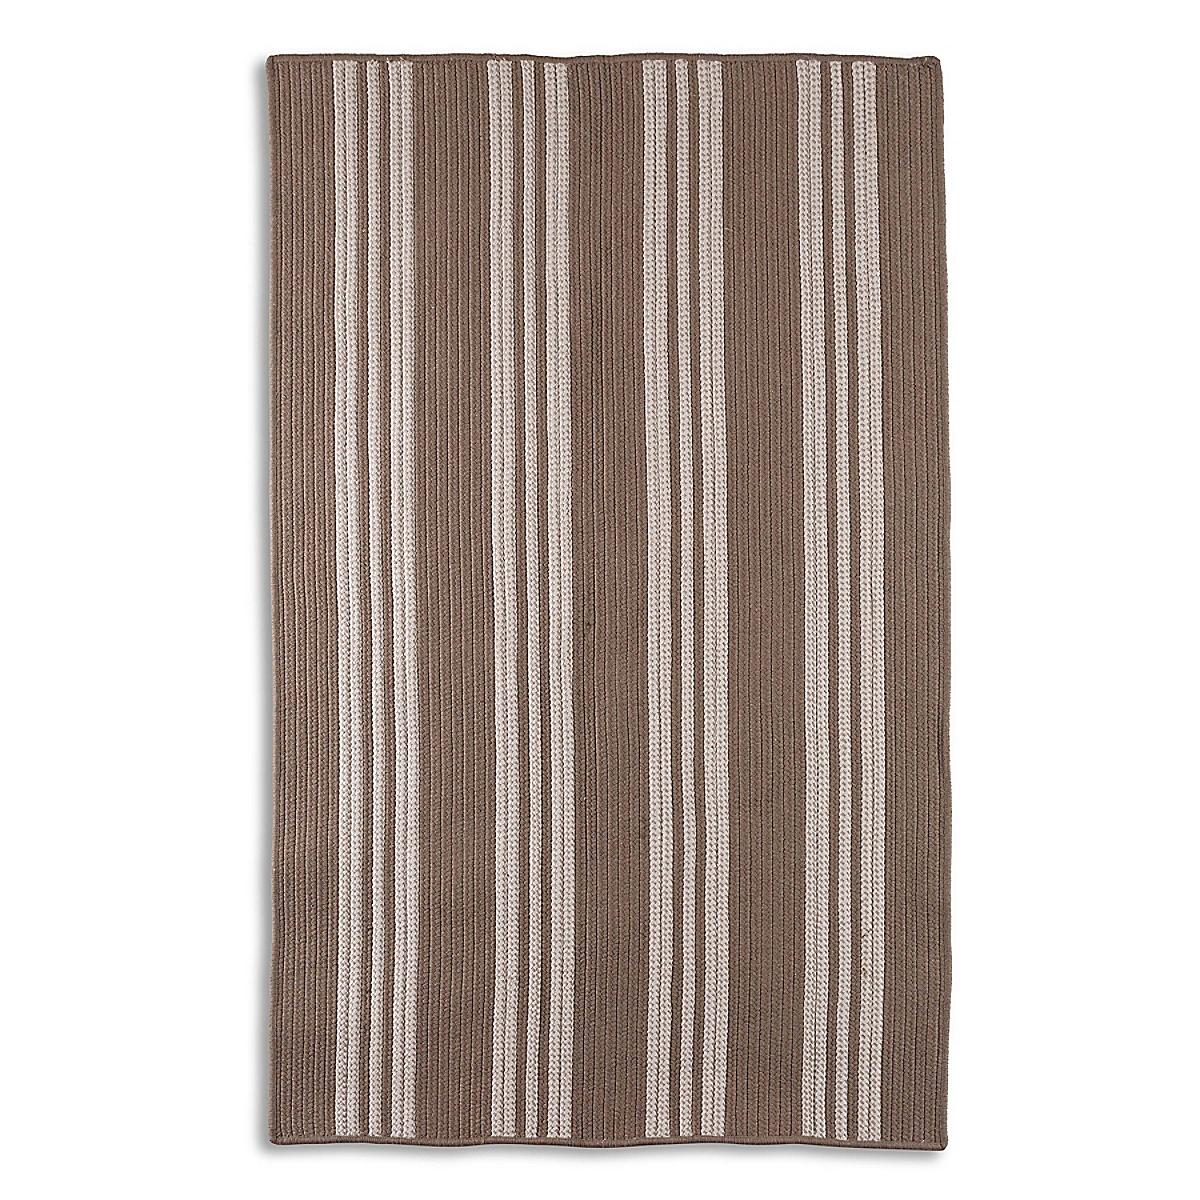 Sunbrella Longboard Rug - Latte